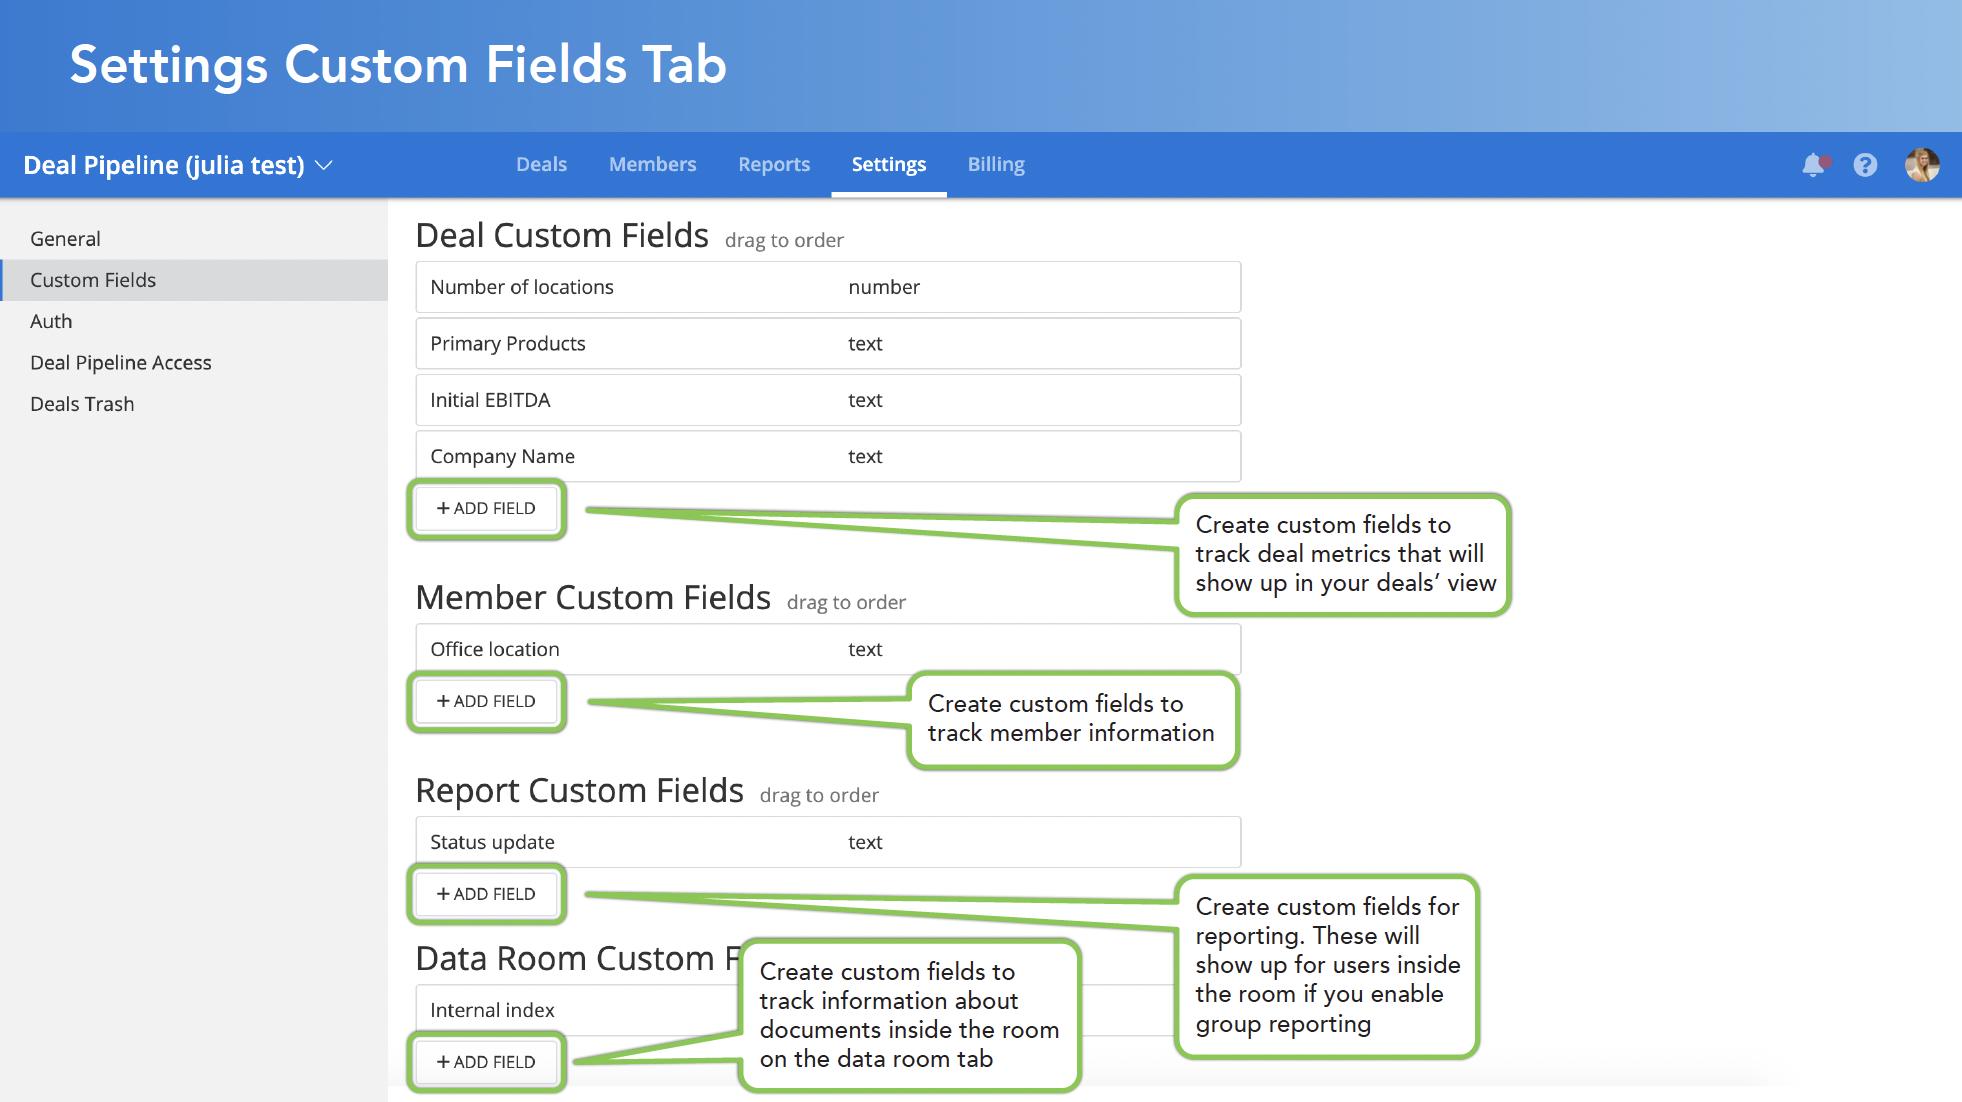 Settings Custom Fields Tab